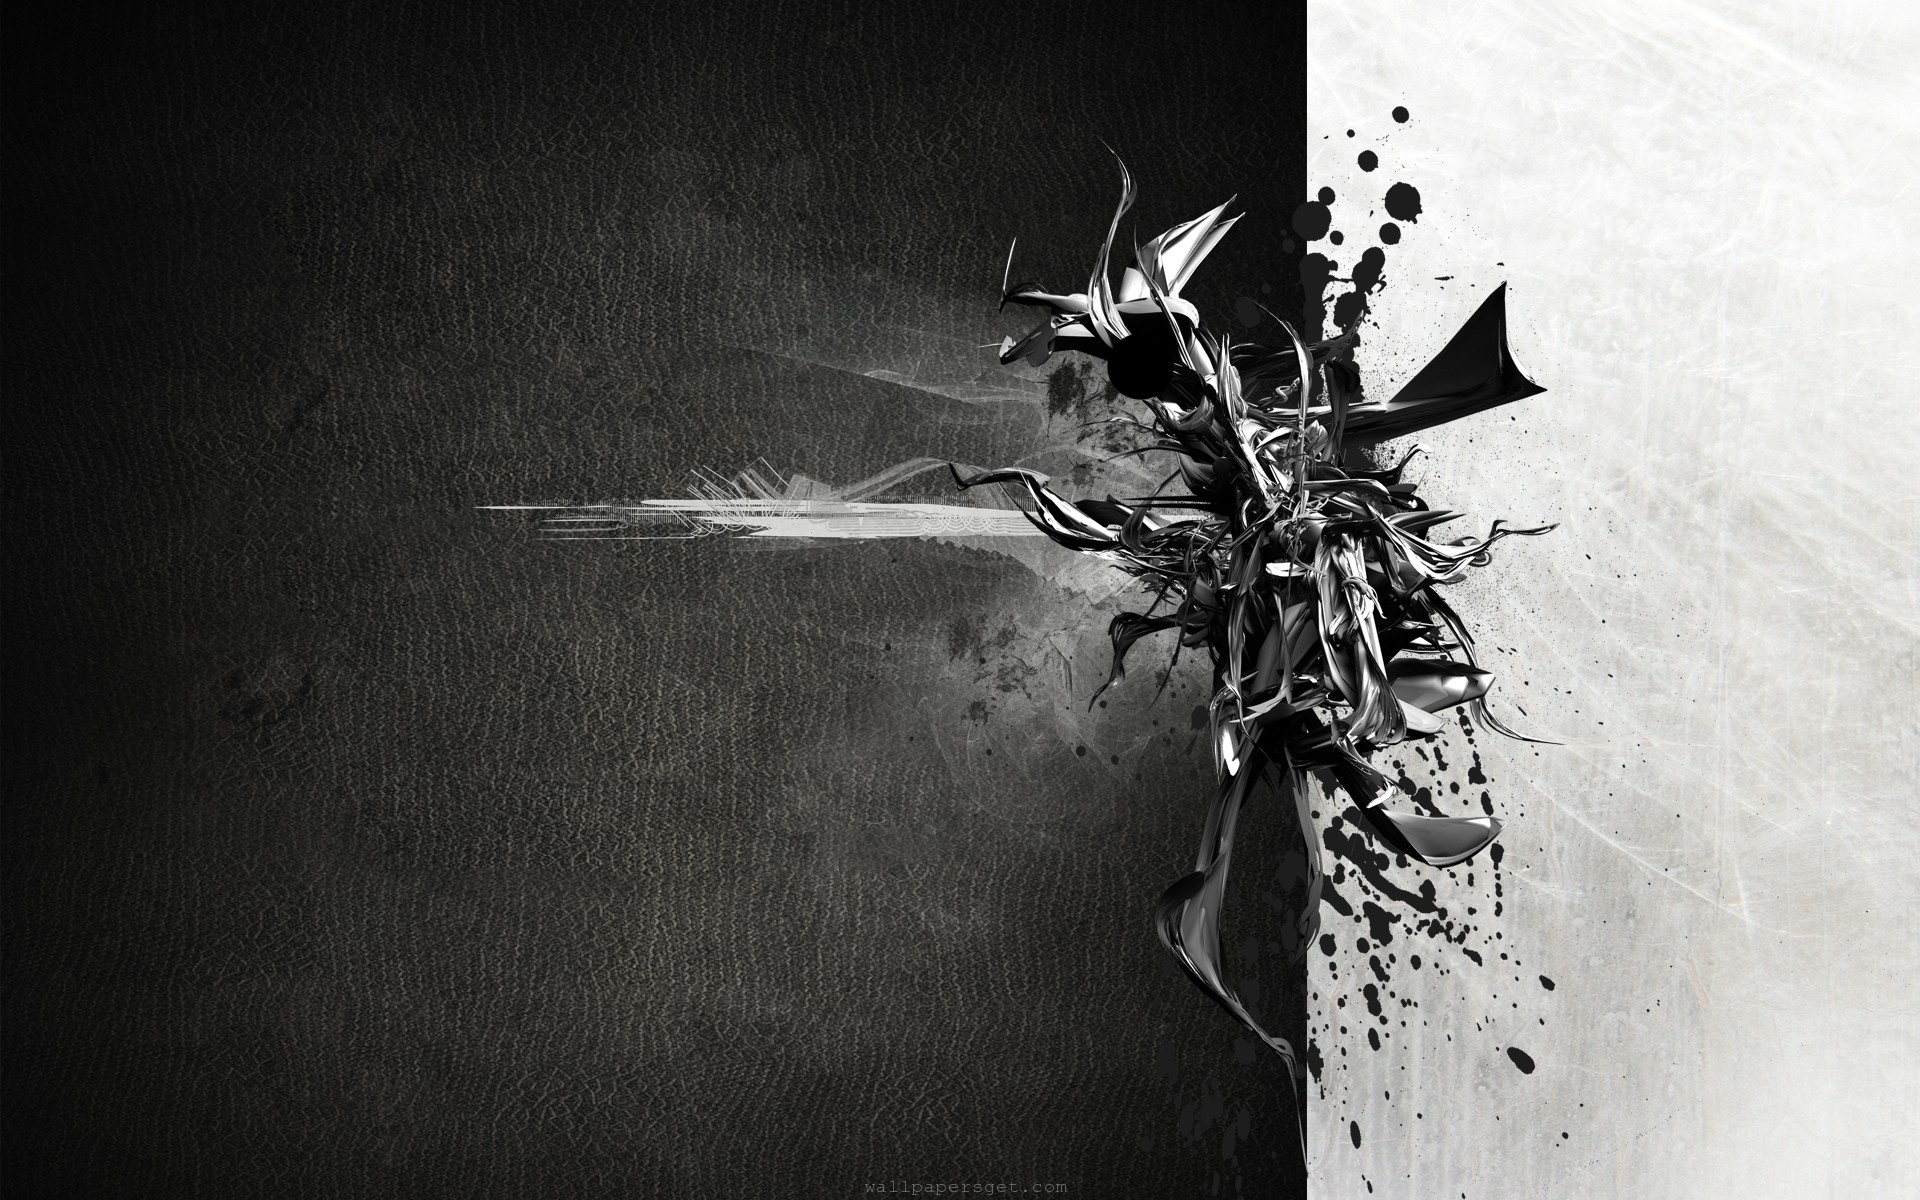 Black And White Abstract Wallpaper - WallpaperSafari